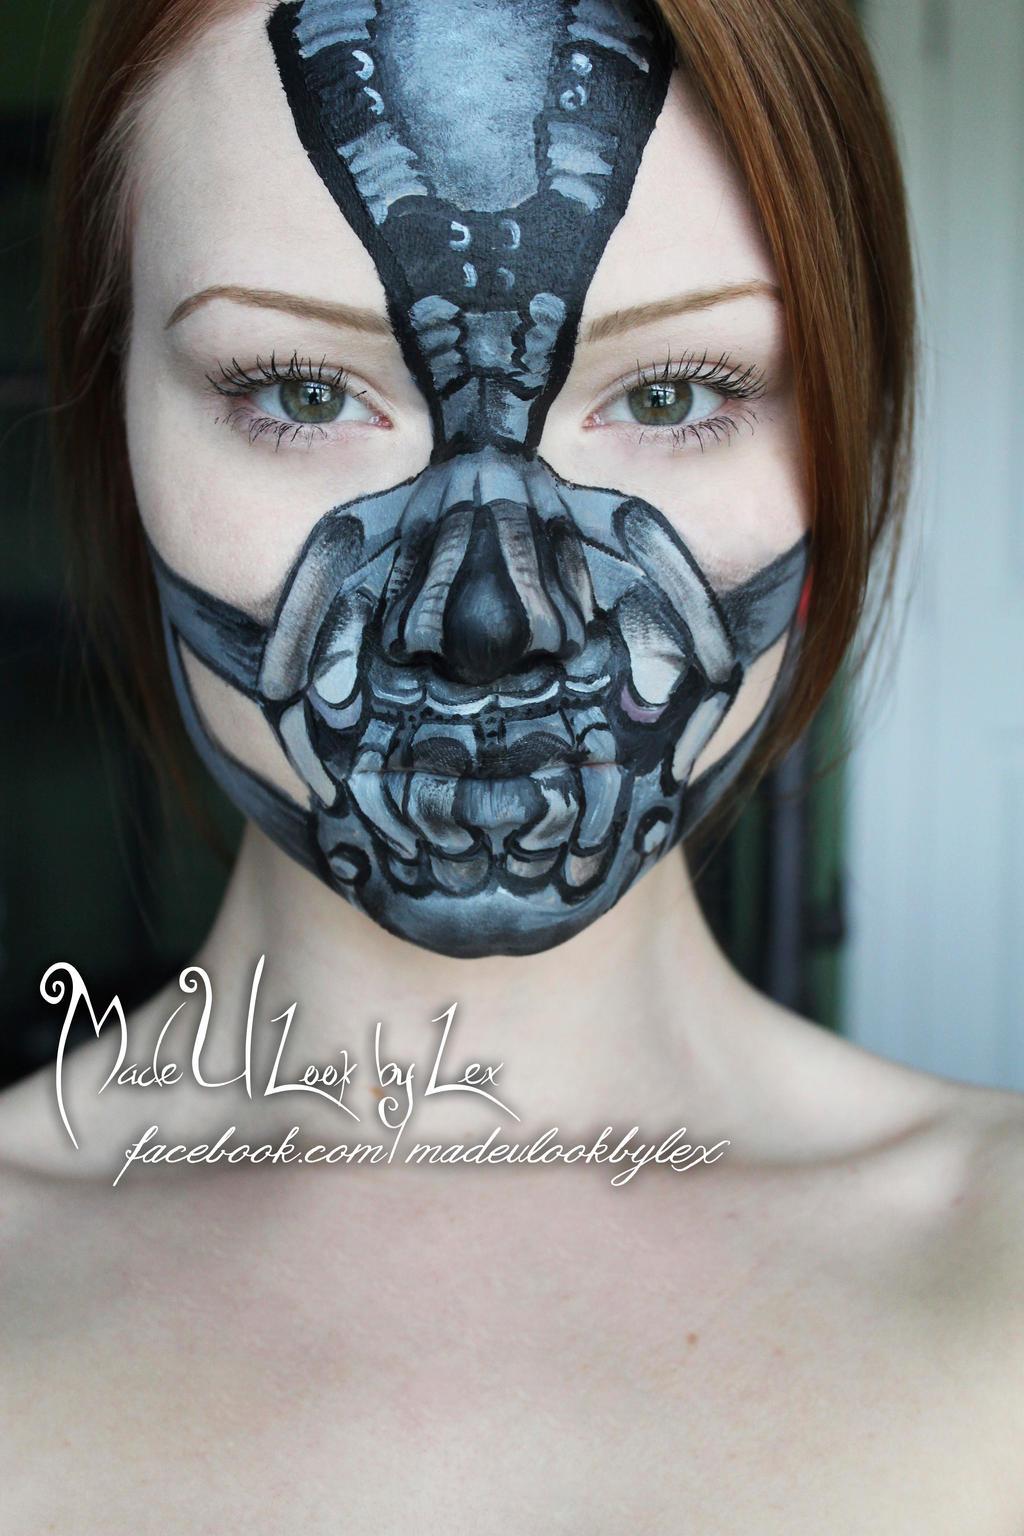 Bane by MadeULookbylex